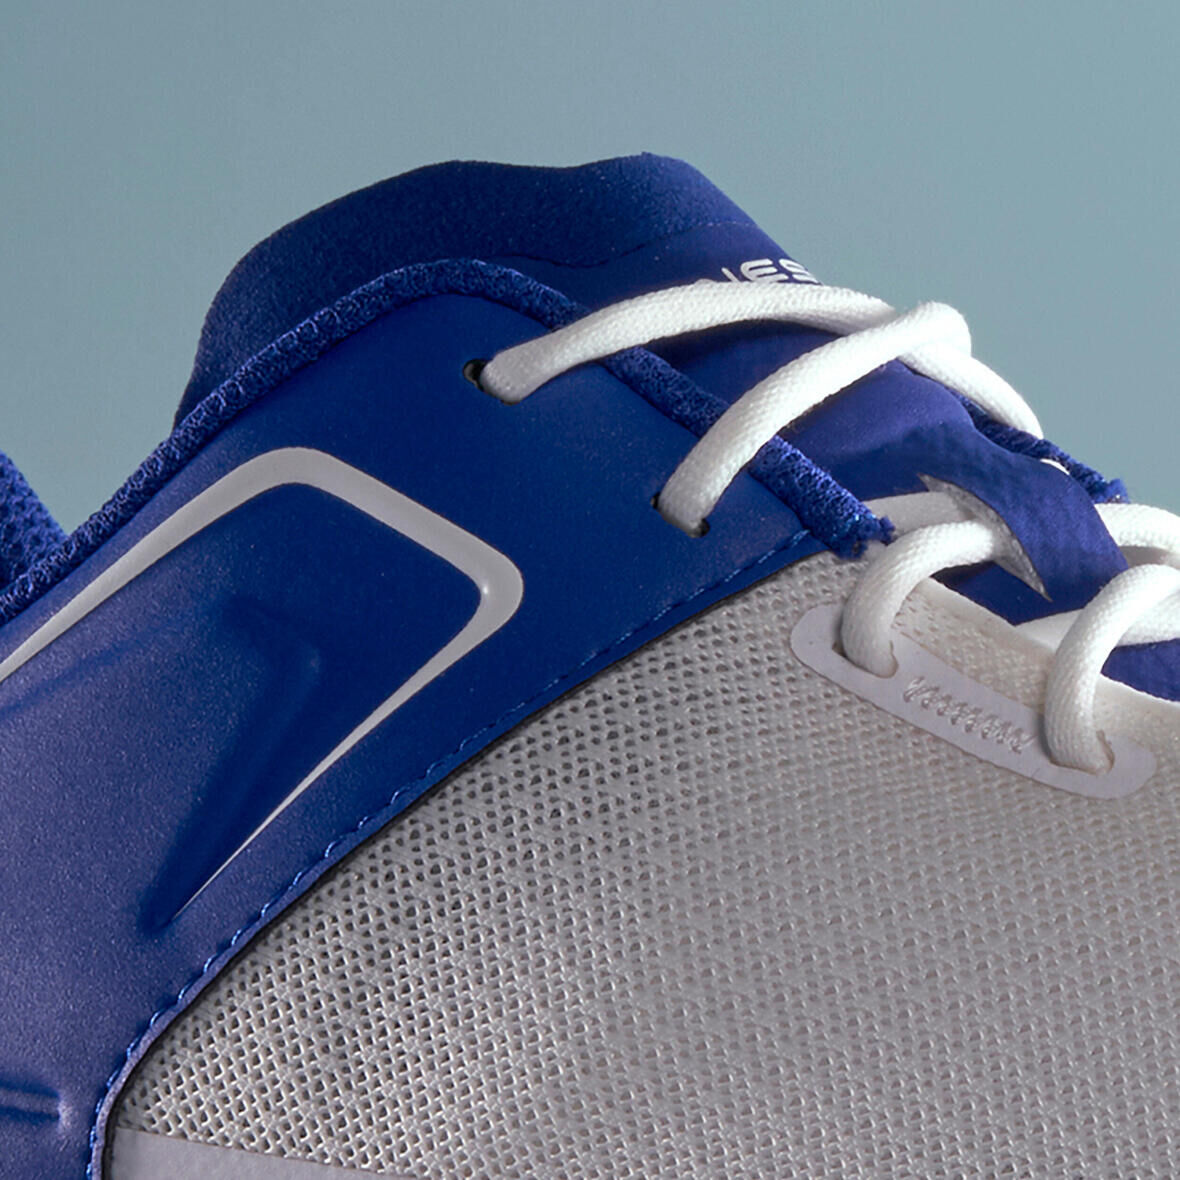 stoffen-onderhoud-schoenen